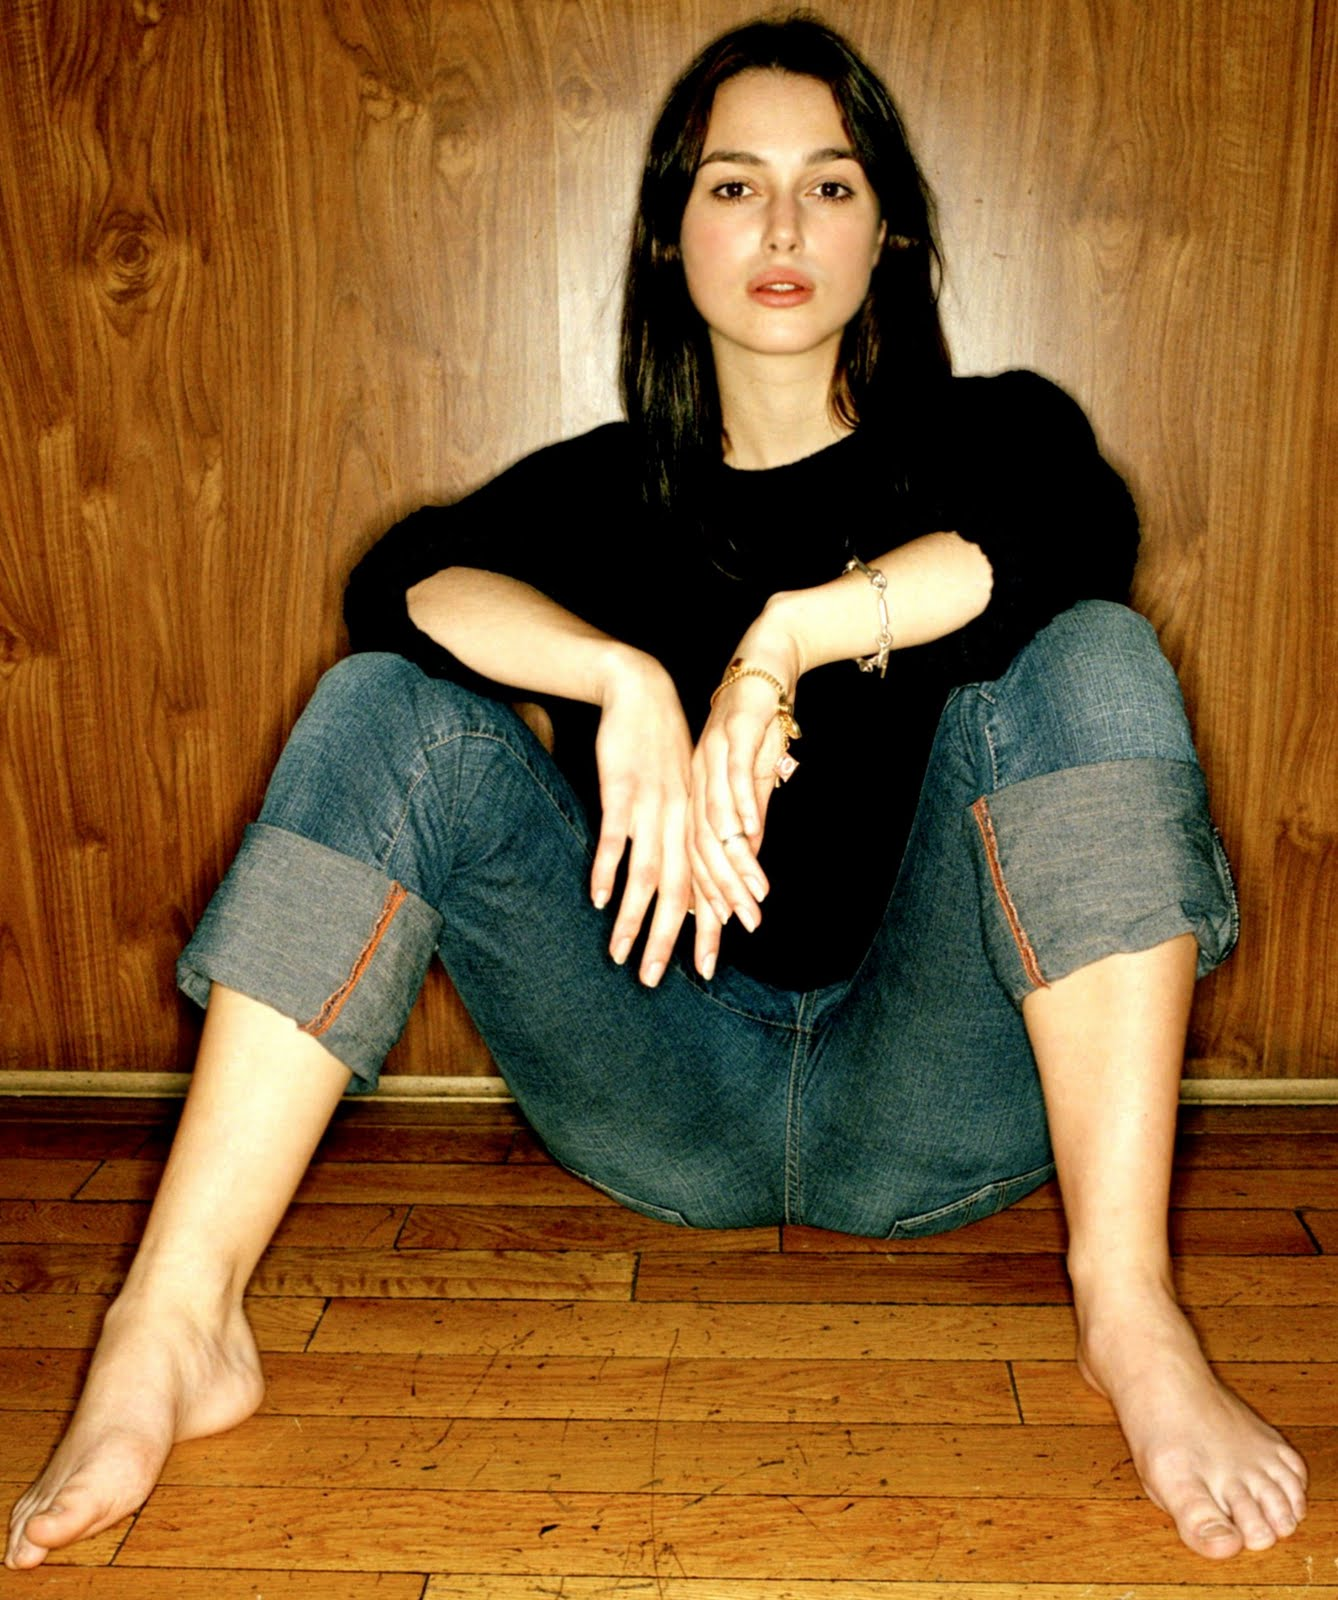 Salma Hayek Nude Photo